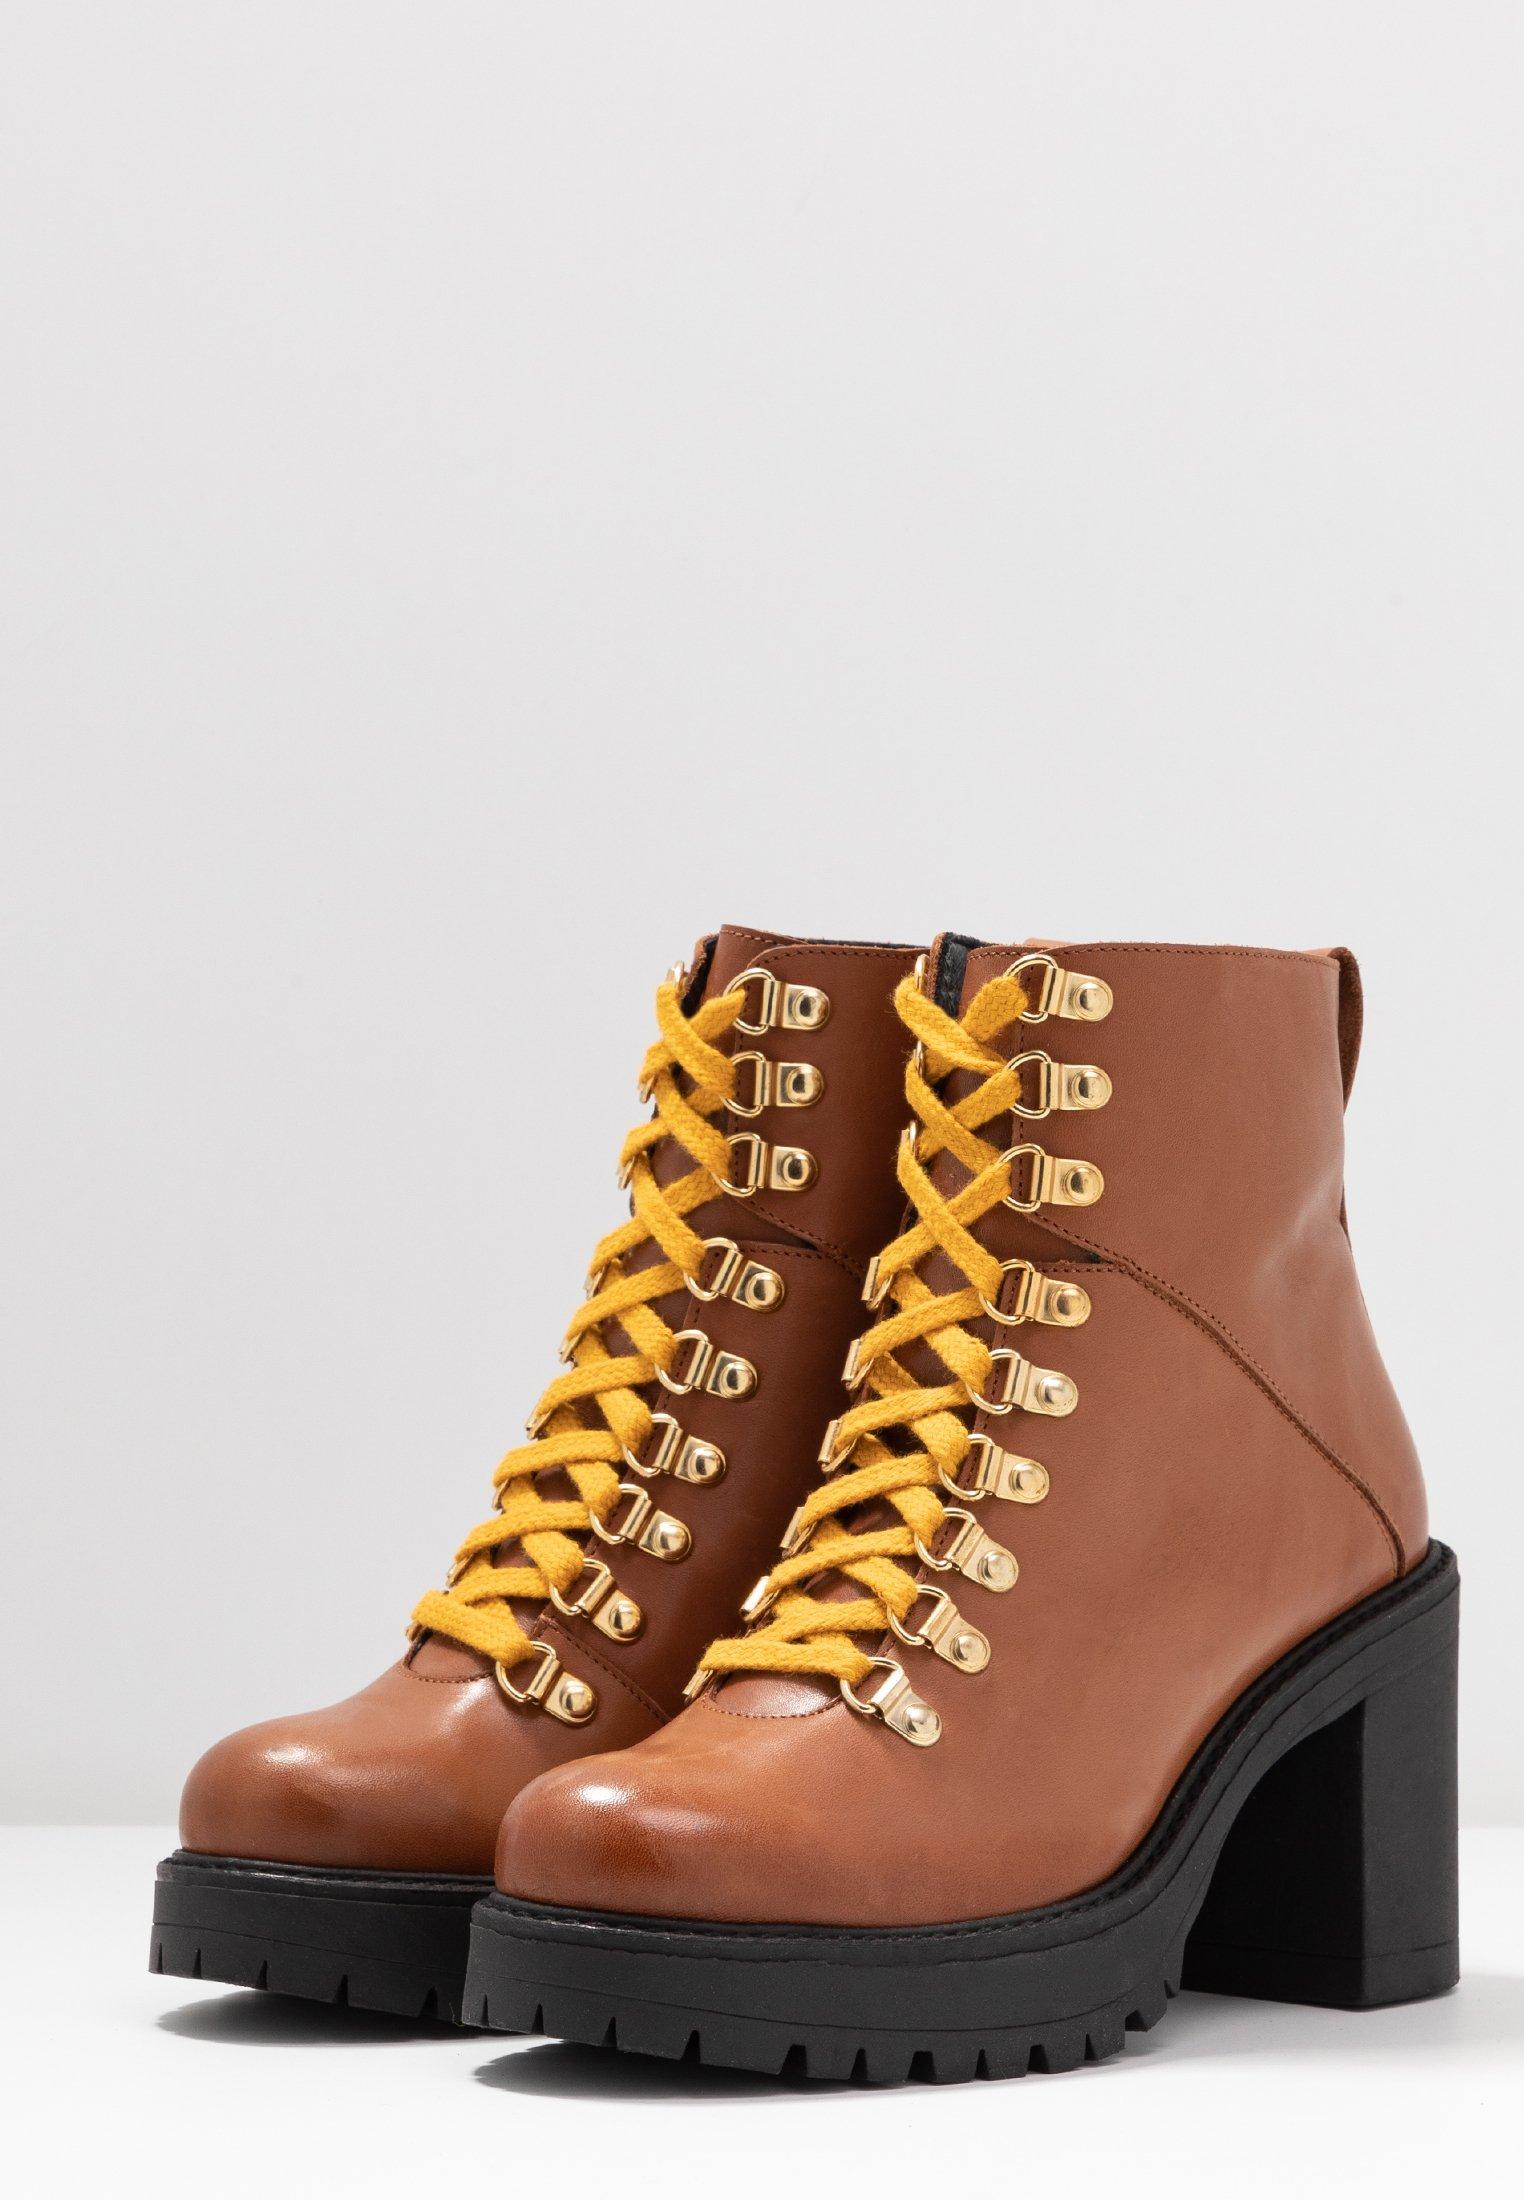 Bianco Biacurtis Boot - Enkellaarsjes Met Hoge Hak Cognac kaUbyxQf